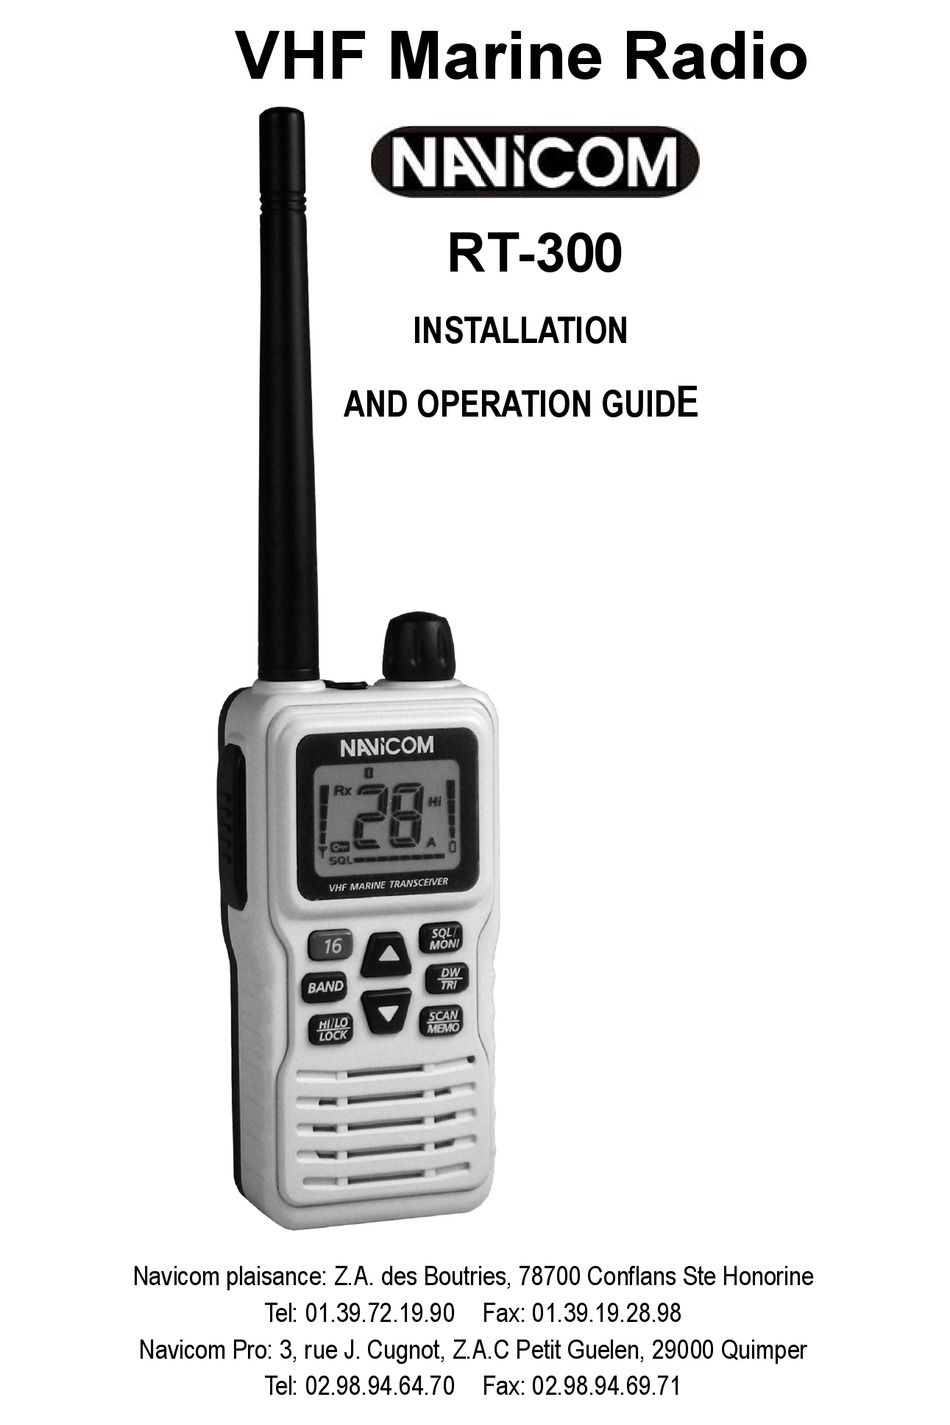 NAVICOM RT-300 INSTALLATION AND OPERATION MANUAL Pdf